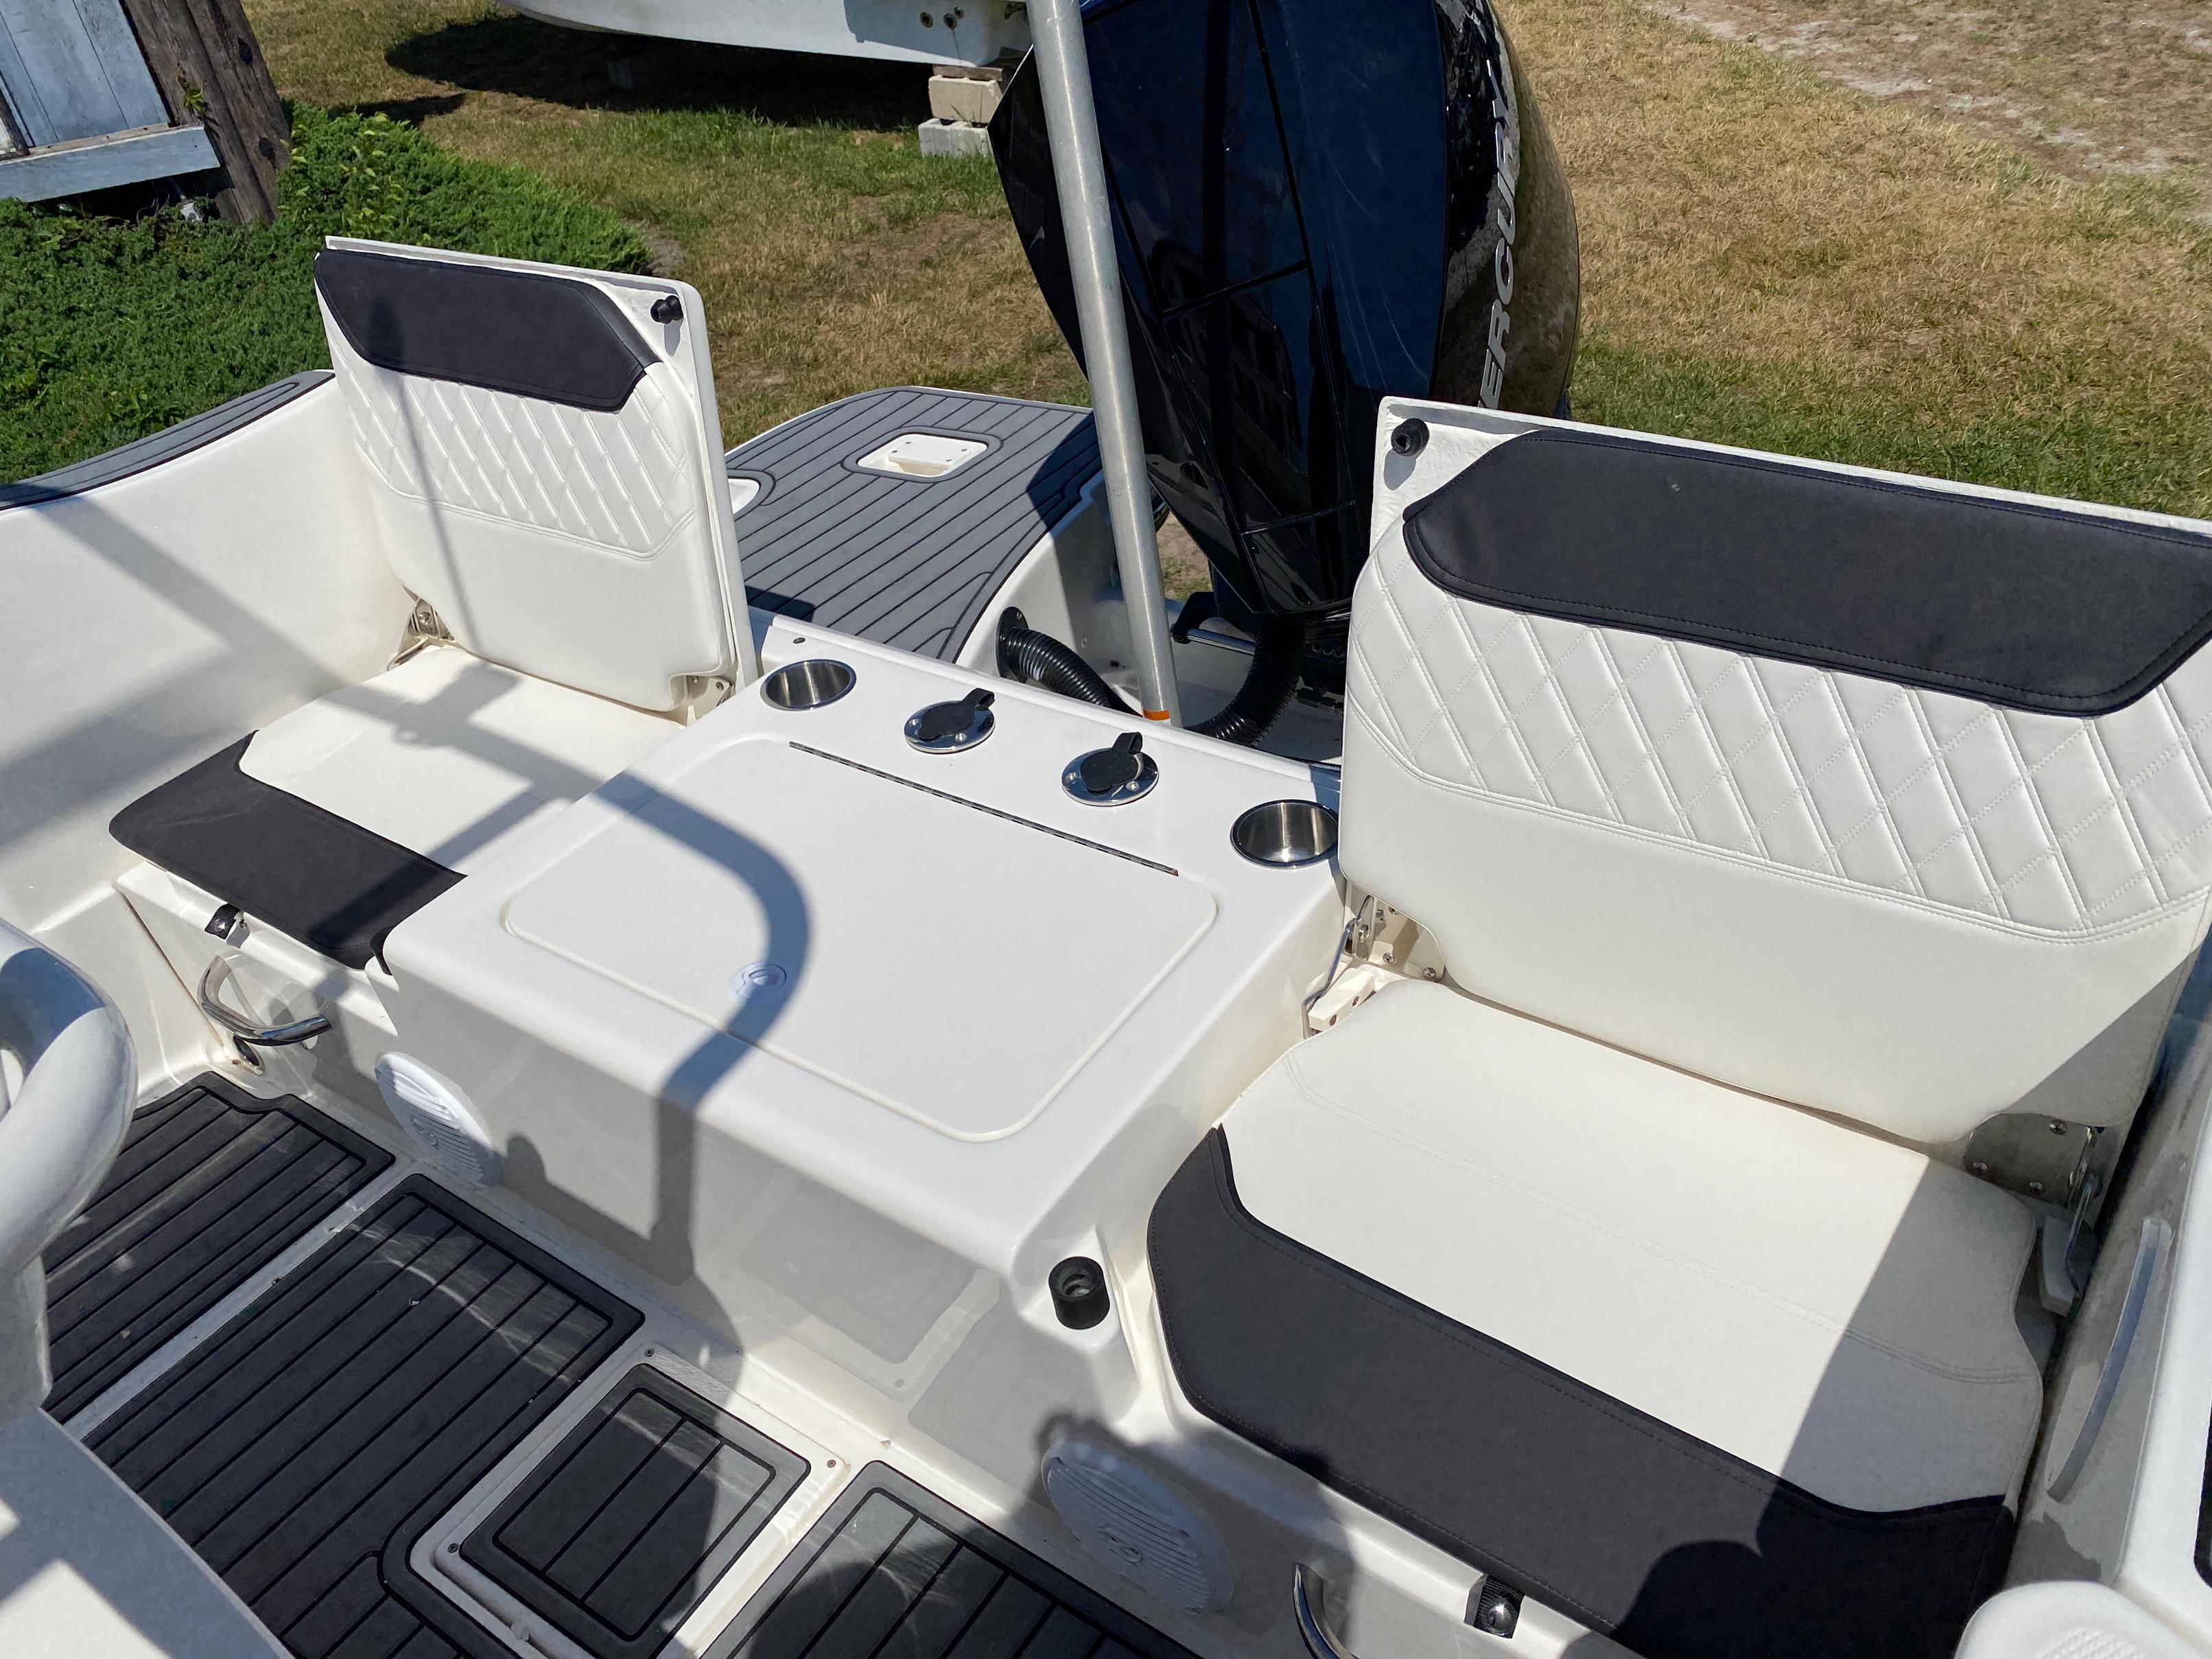 2020 Bayliner boat for sale, model of the boat is Trophy 22CC & Image # 3 of 17